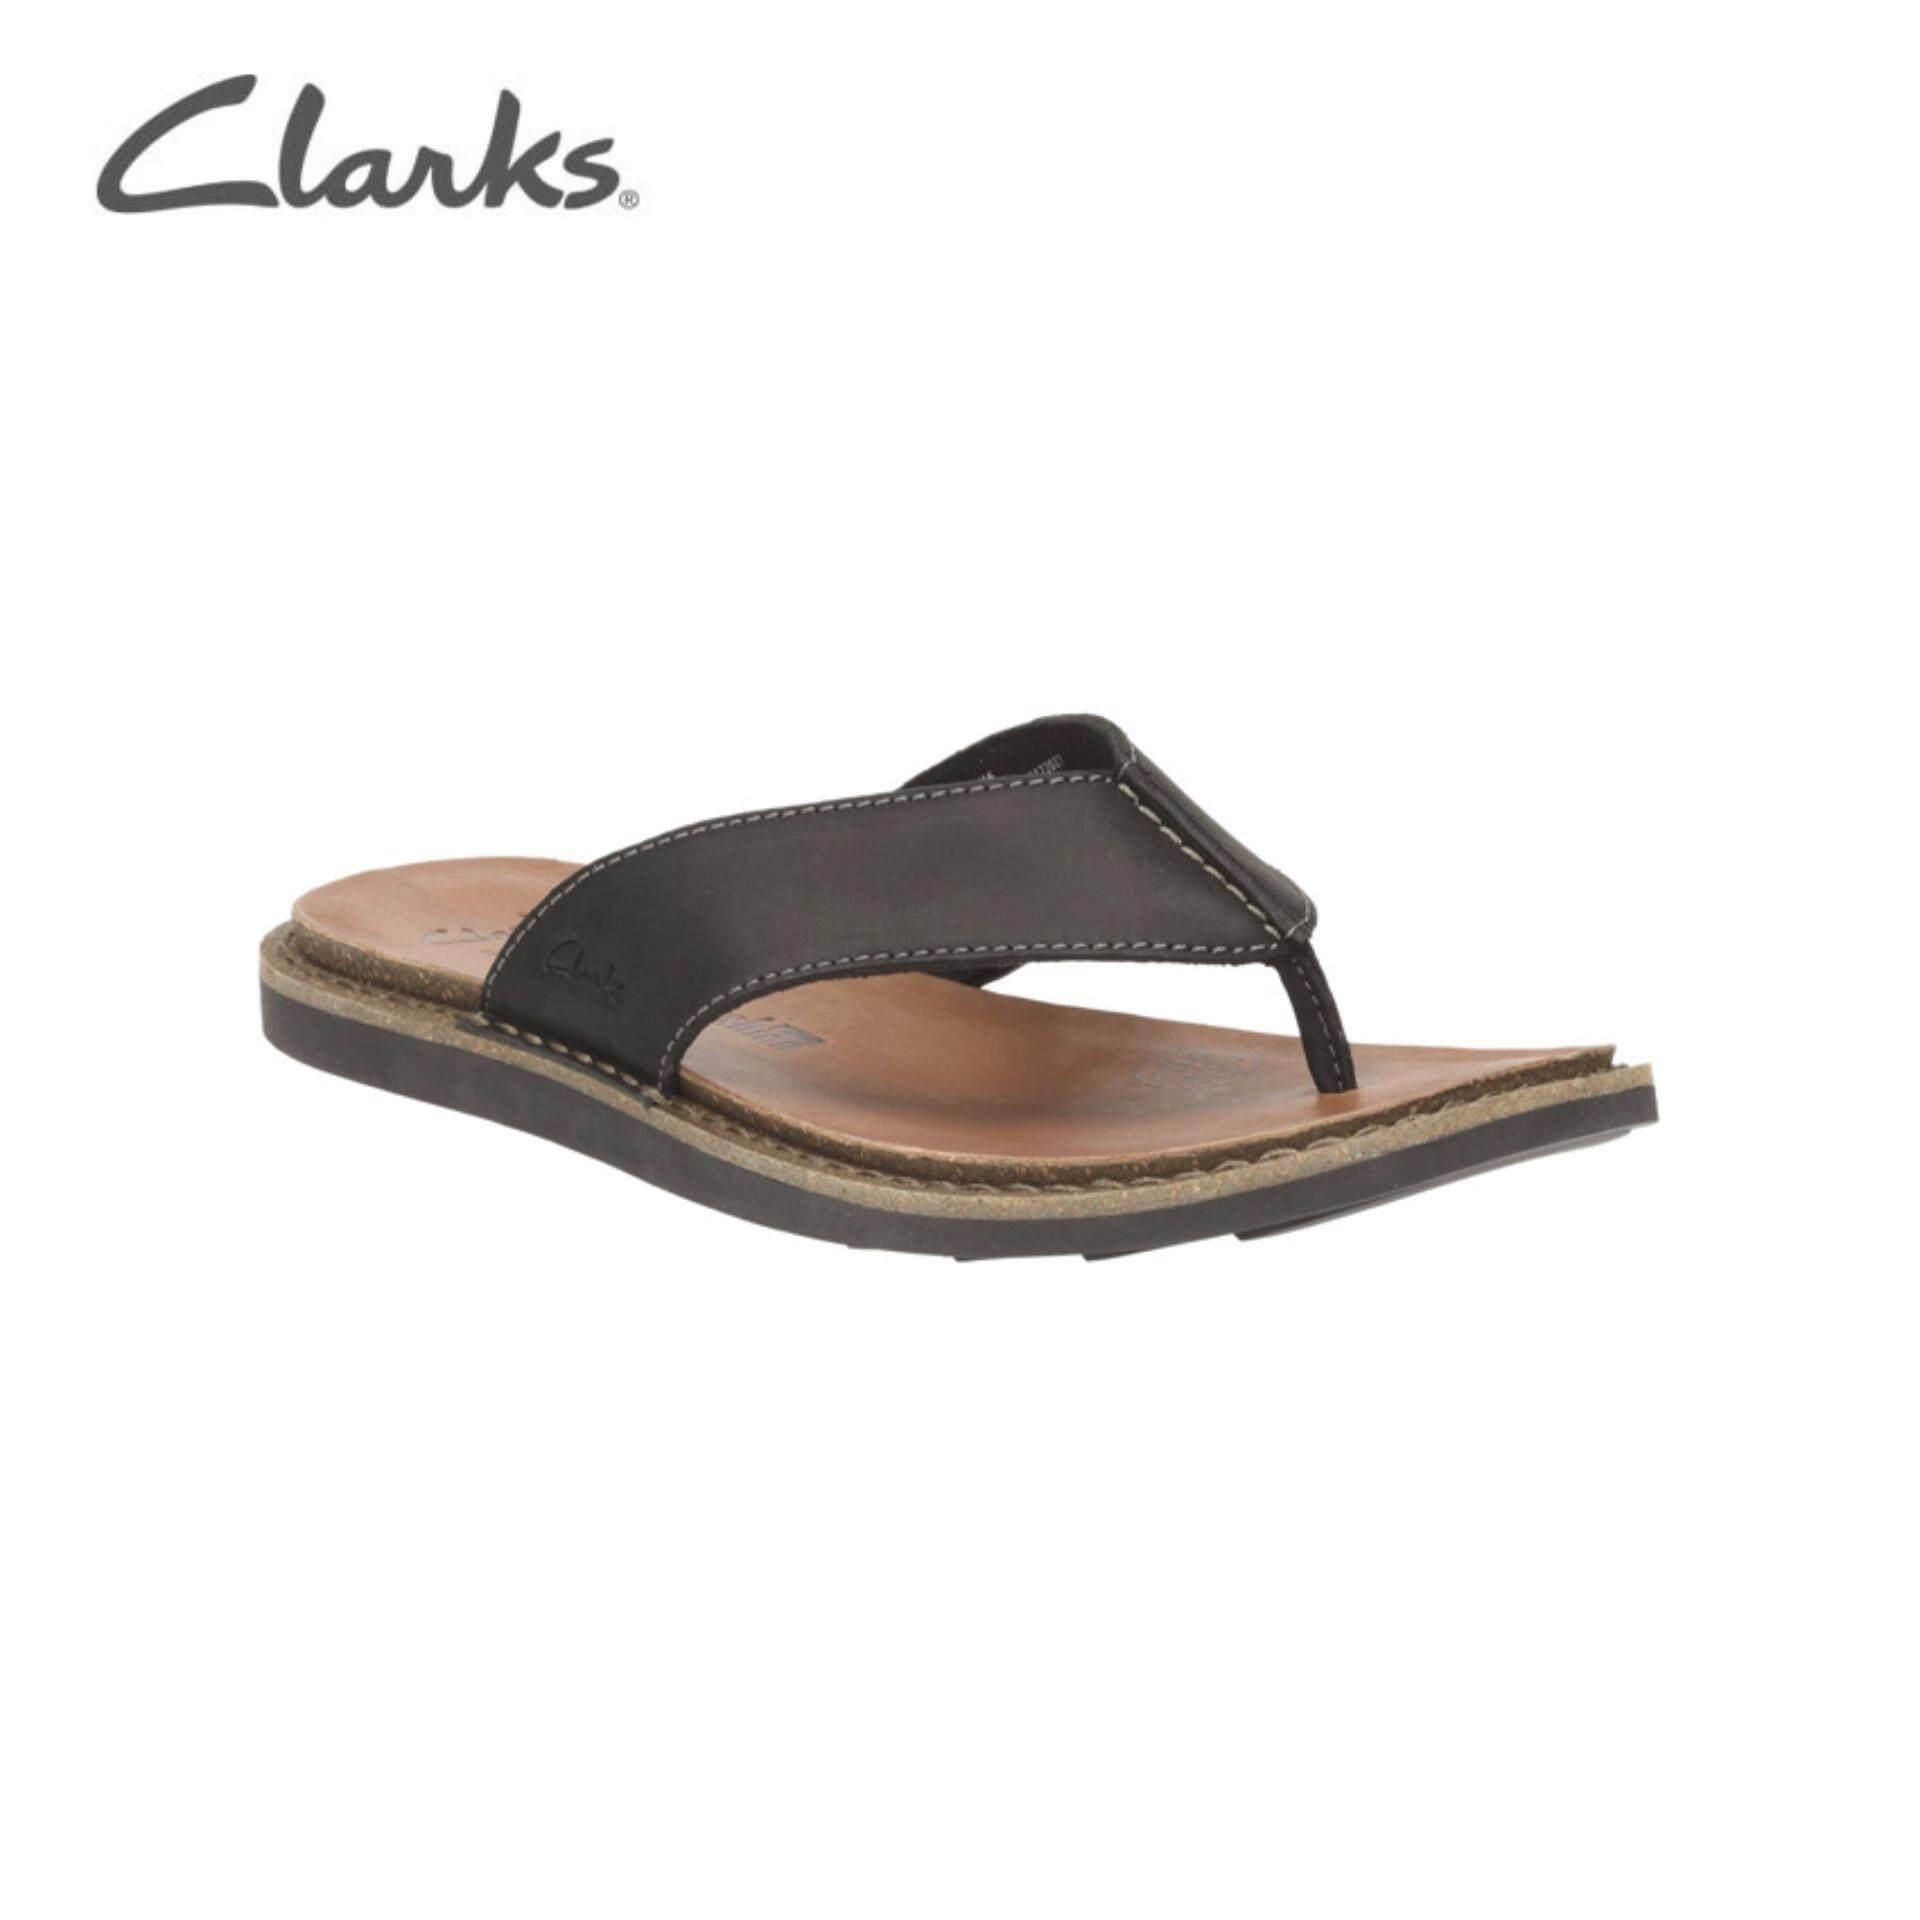 7fc3db110fcc Clarks Lynton Post Mens Casual Sandals (Black Leather)